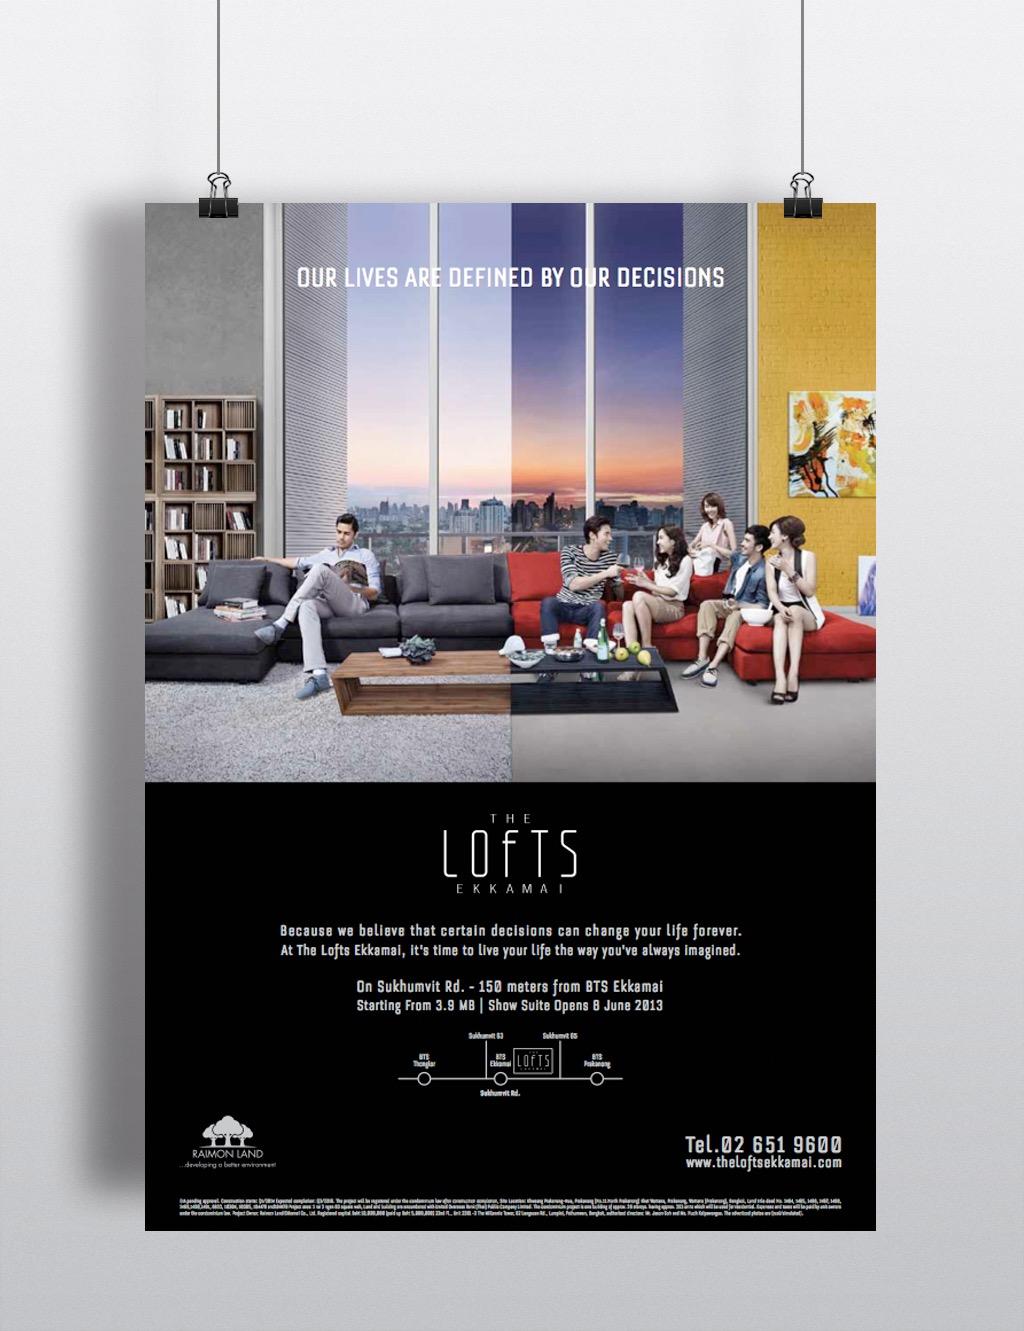 Lofts Ekkamai - conspiracy creative digital agency